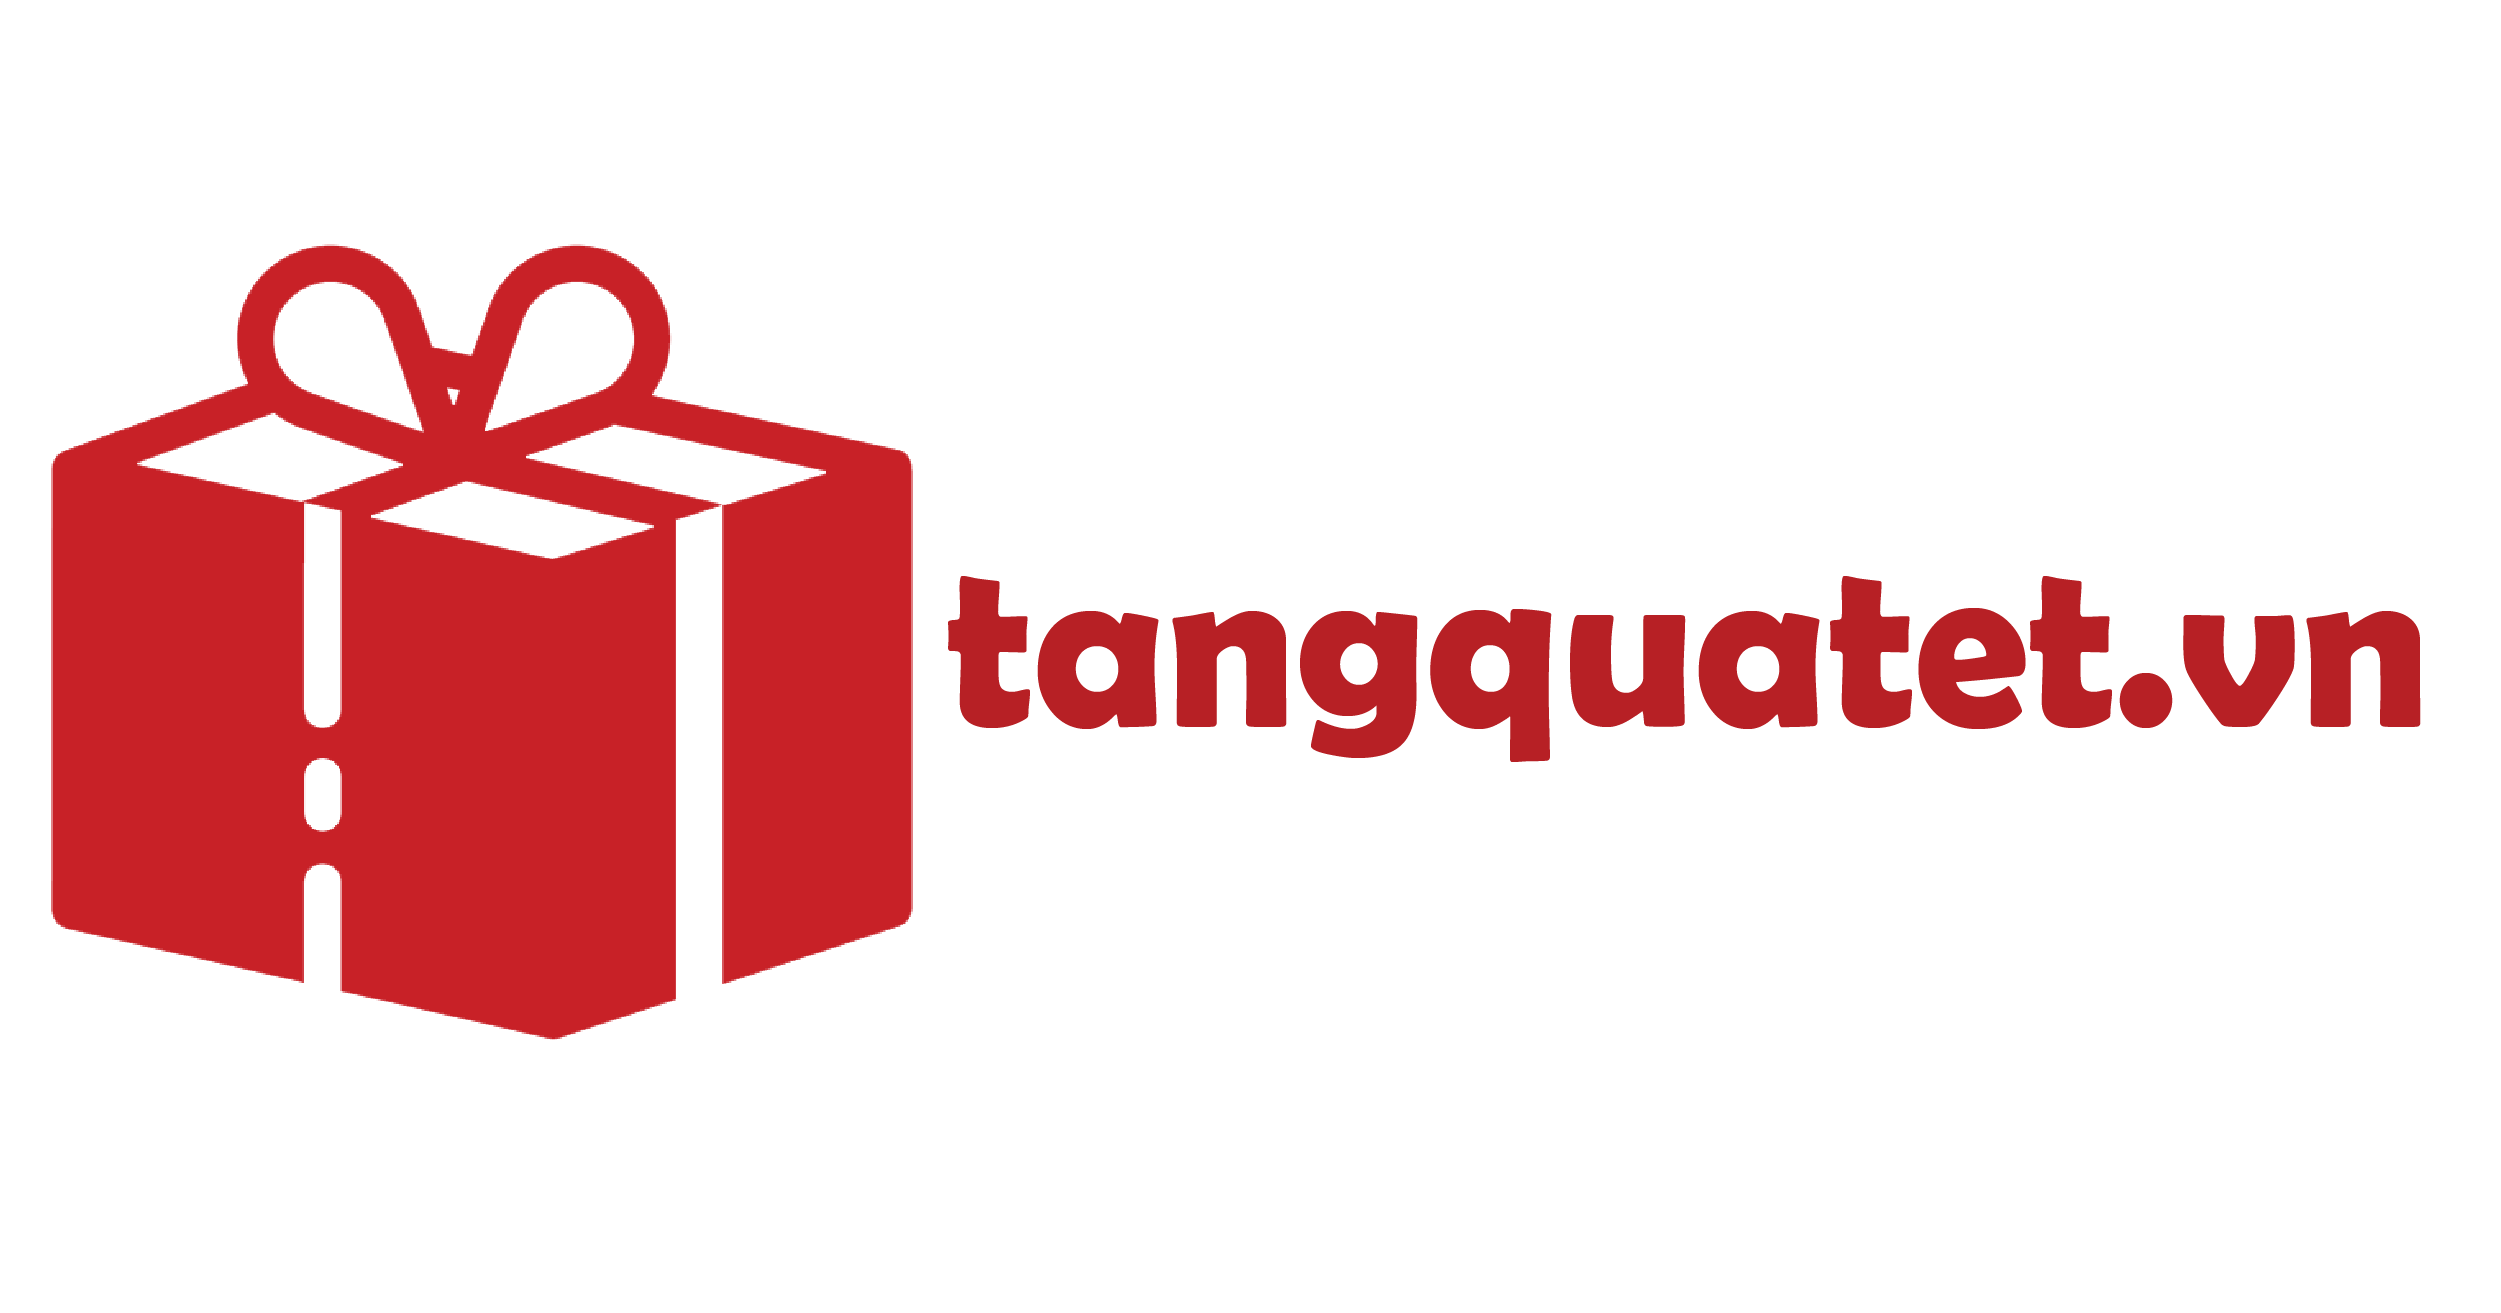 Tangquatet.vn